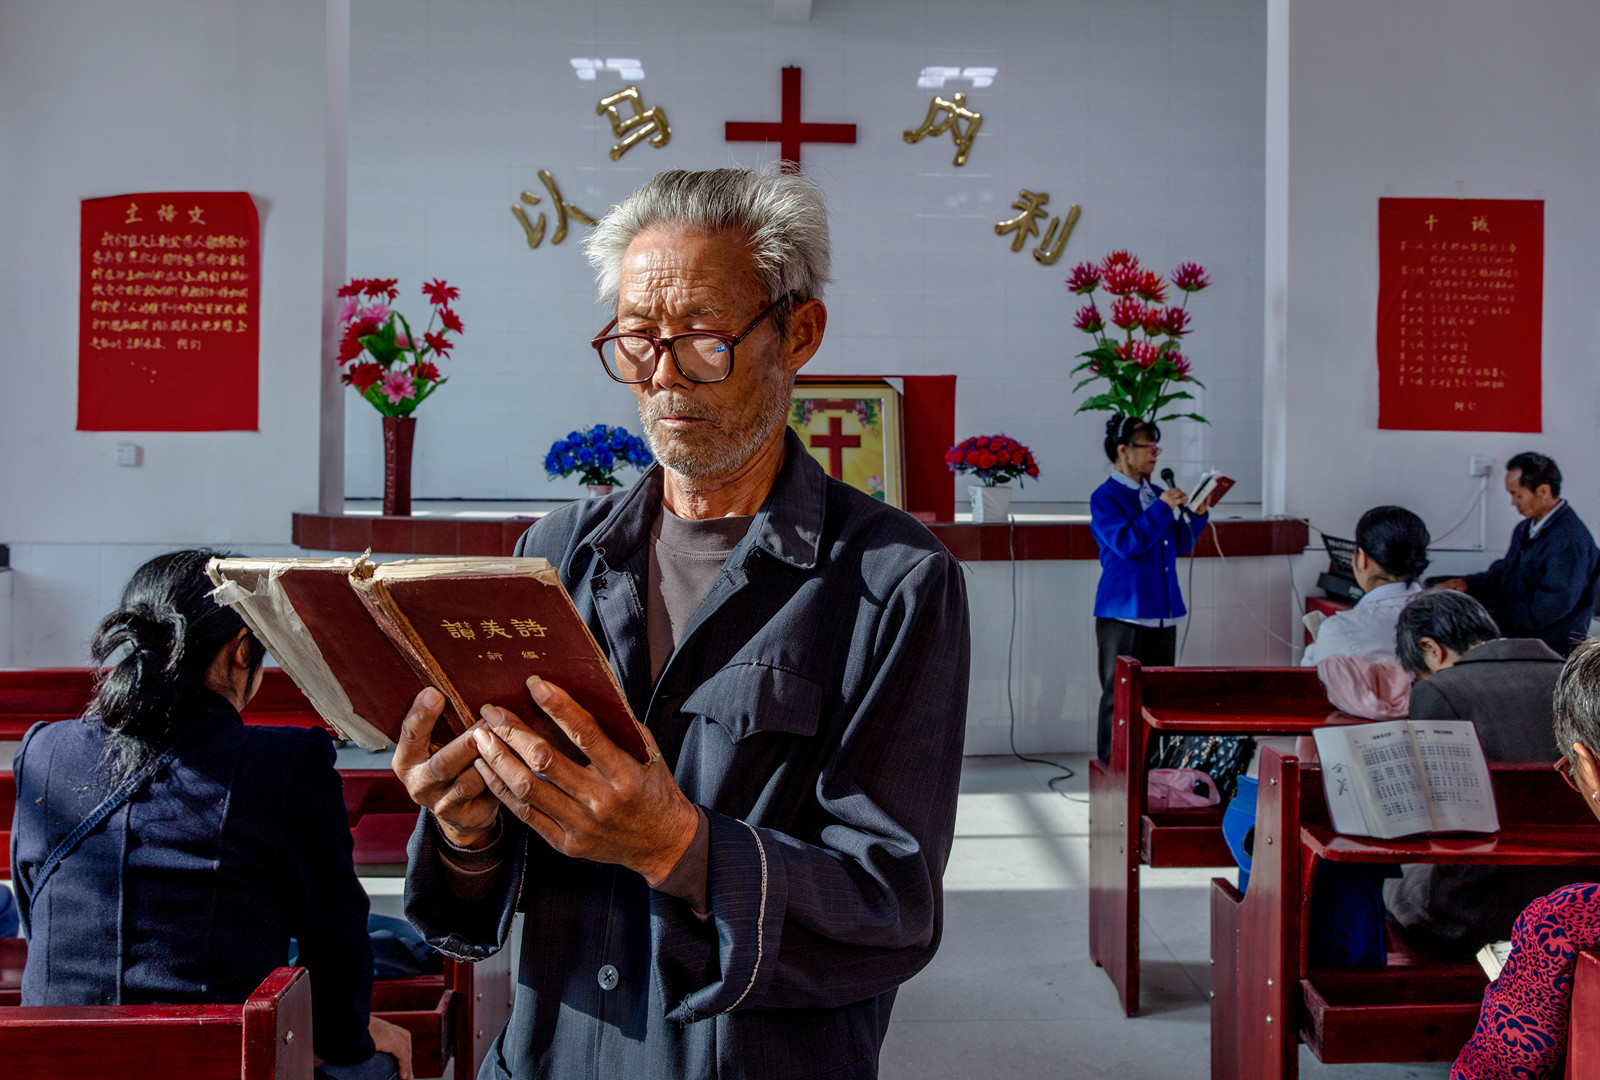 kuang-huimin-lost-dreams-in-tuokou-photography-of-china-12.jpg